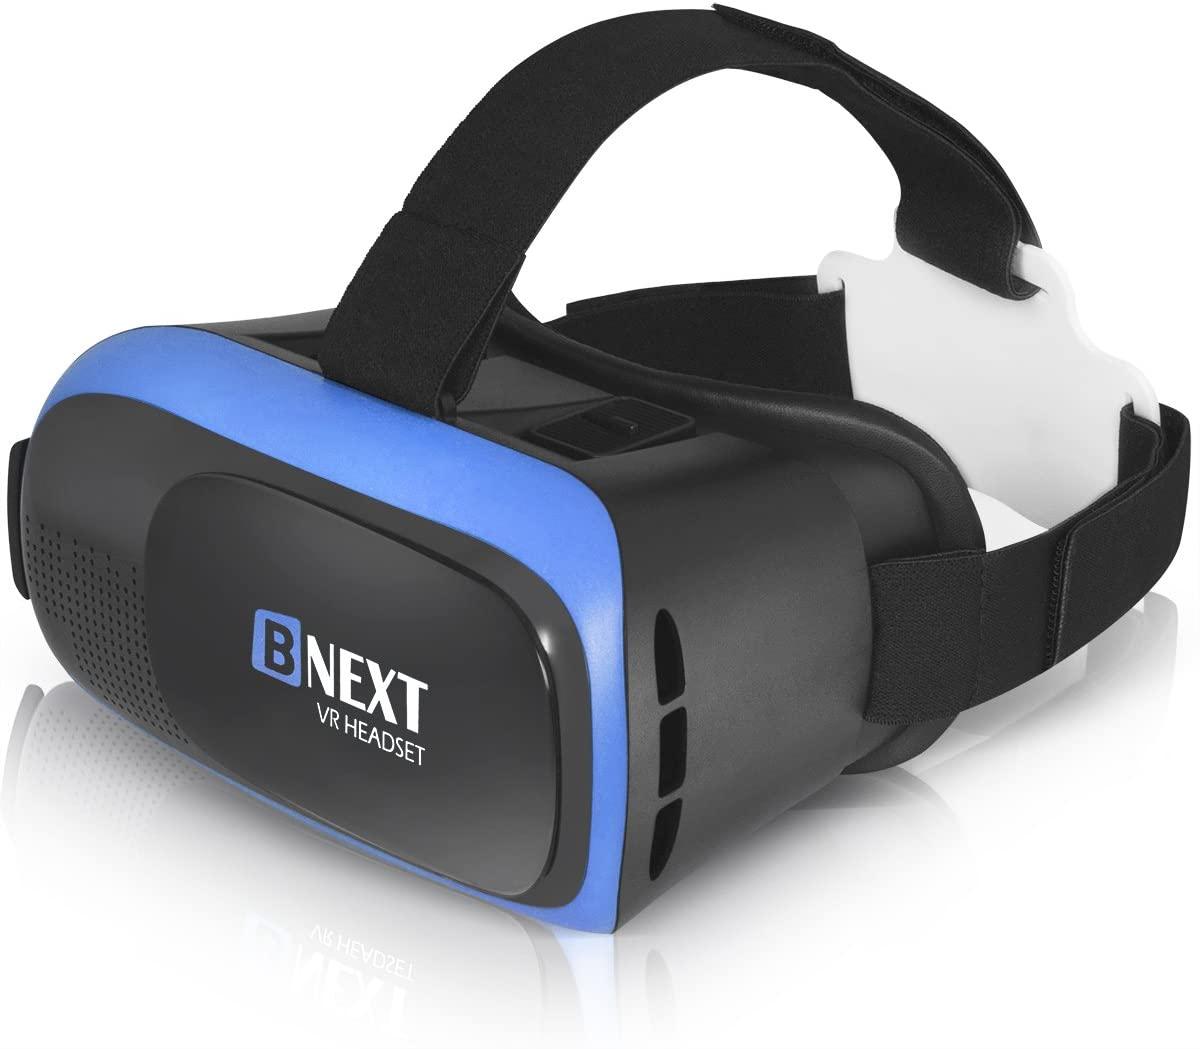 VR Headset - Bnext